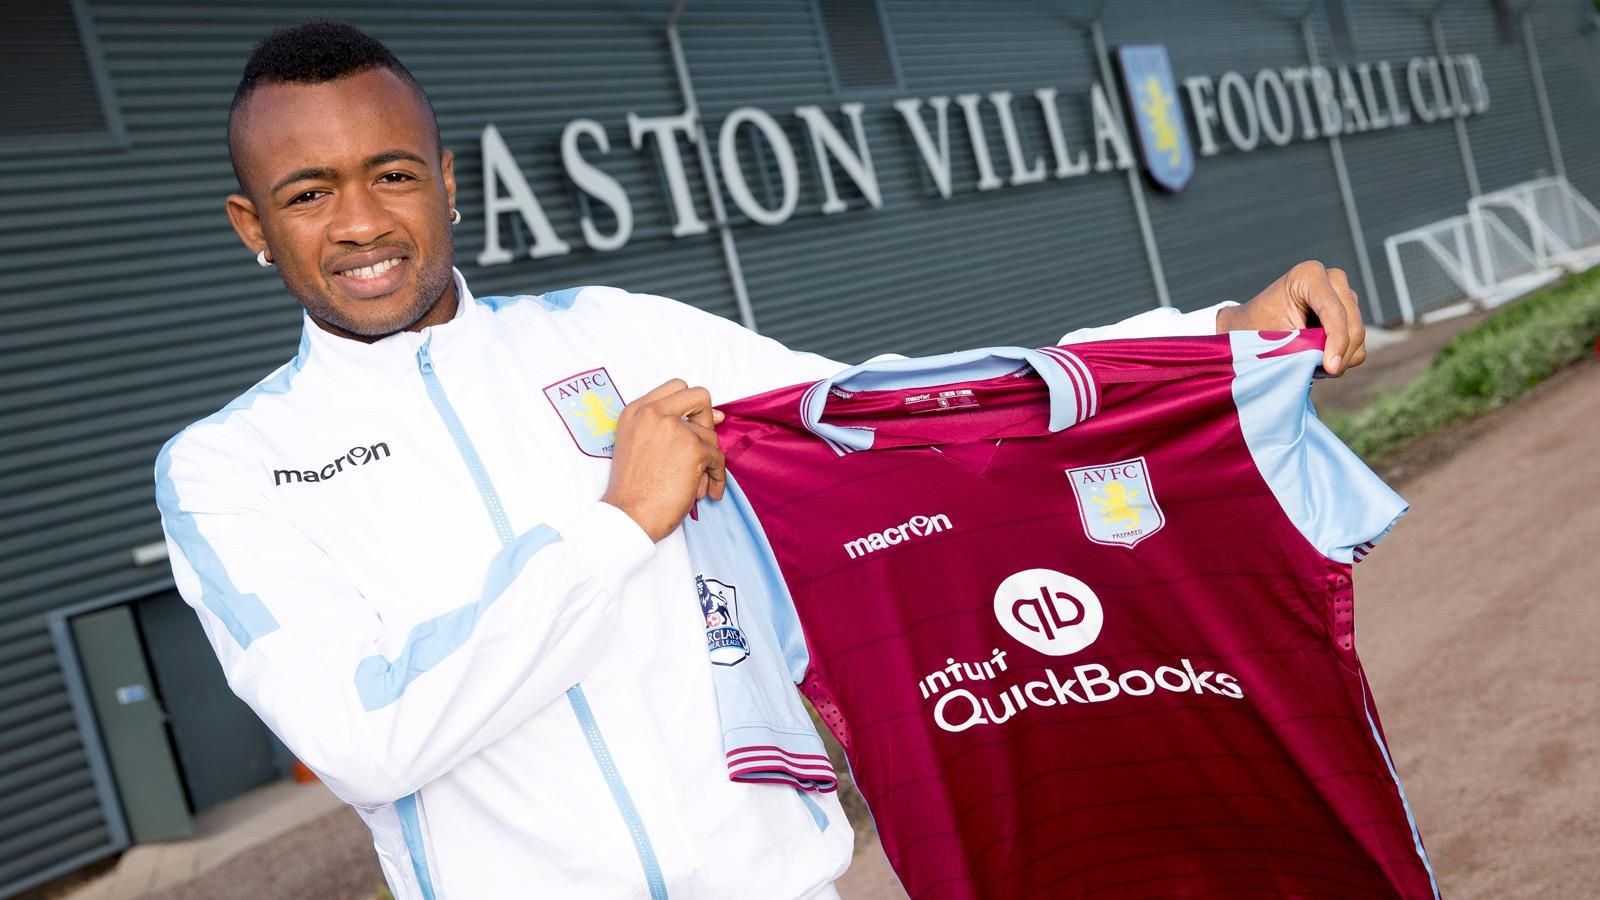 Aston Villa sign forward Jordan Ayew from Lorient on 5-year deal